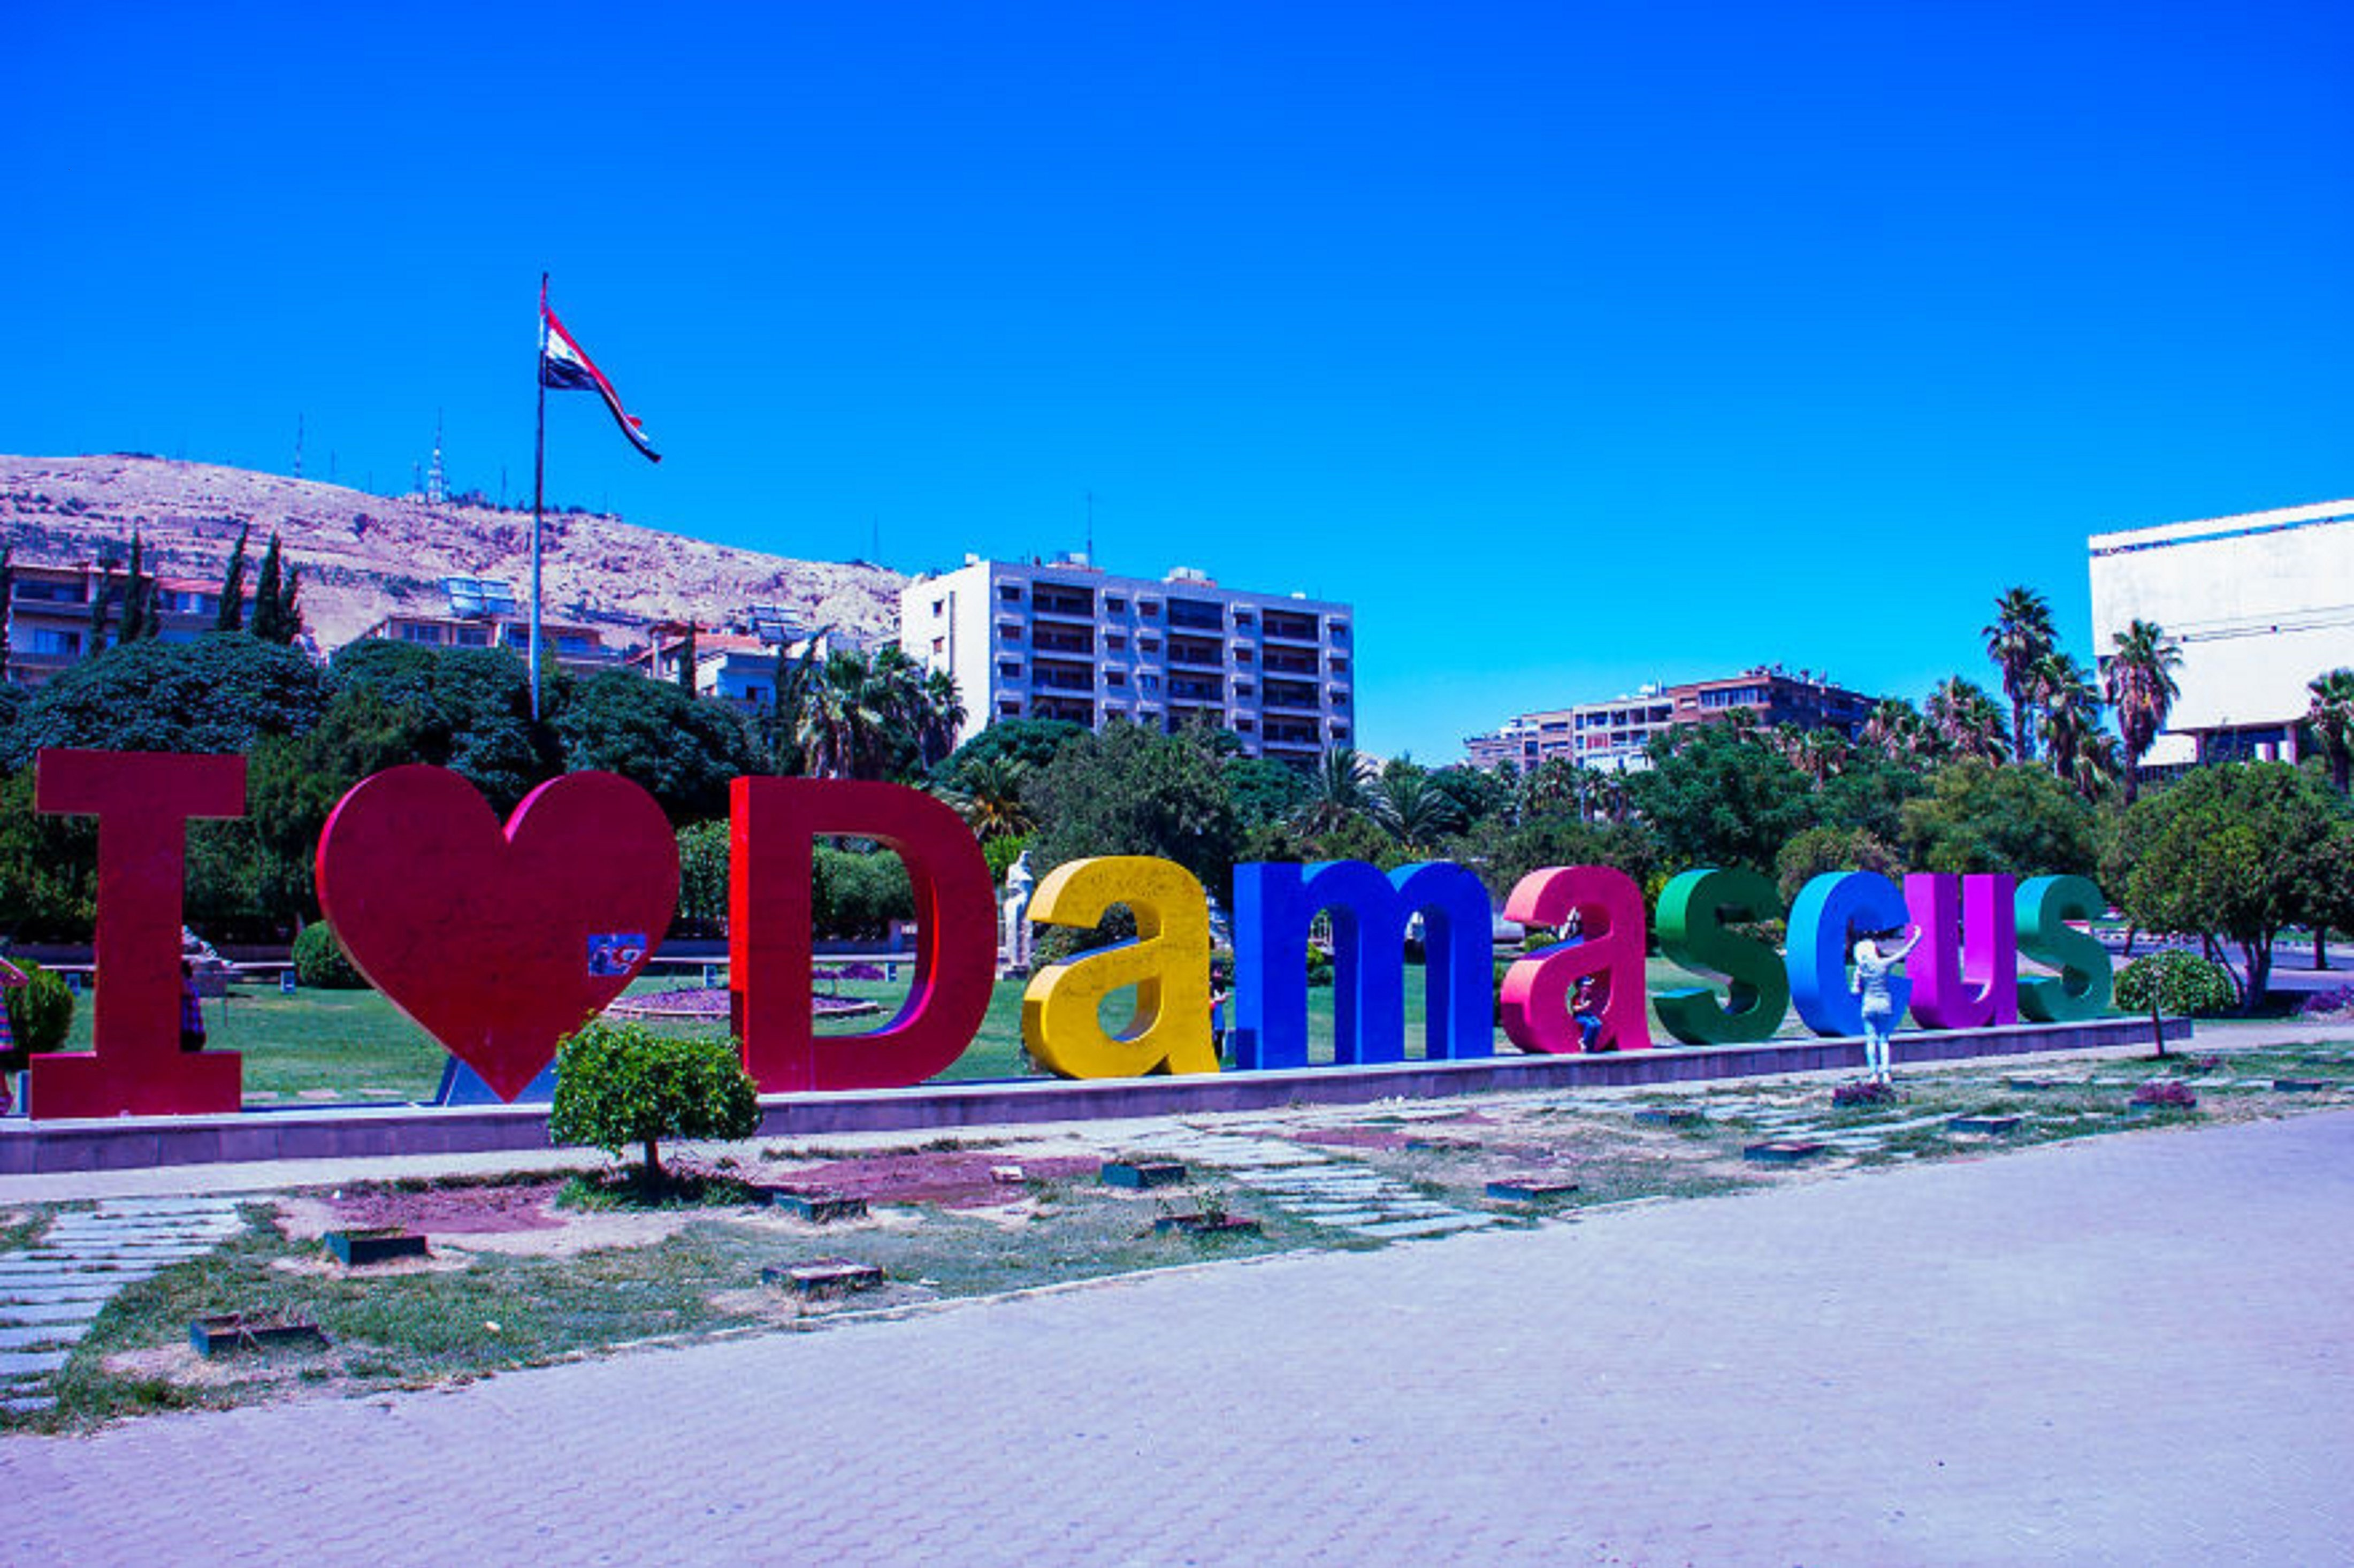 J'aime Damas